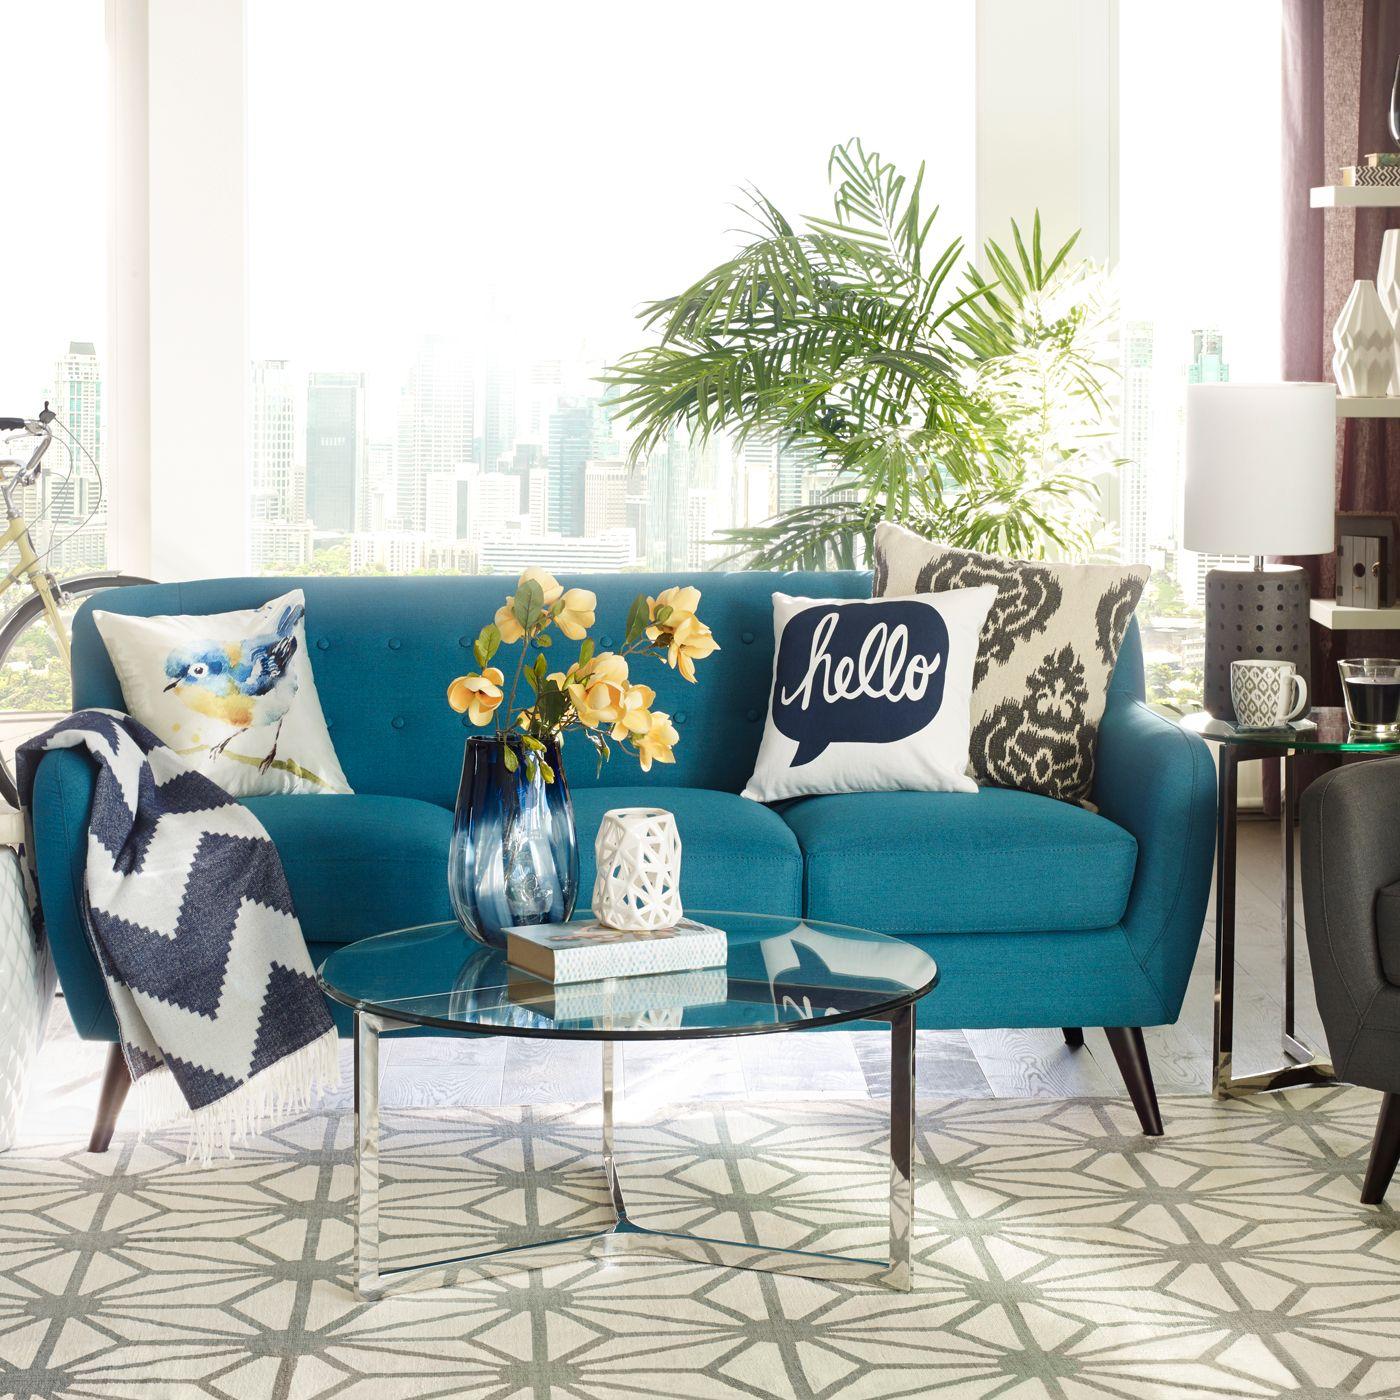 The Addison Sofa So Cute And So Fresh For Spring Urban Barn Decor Sofa Living Room Room